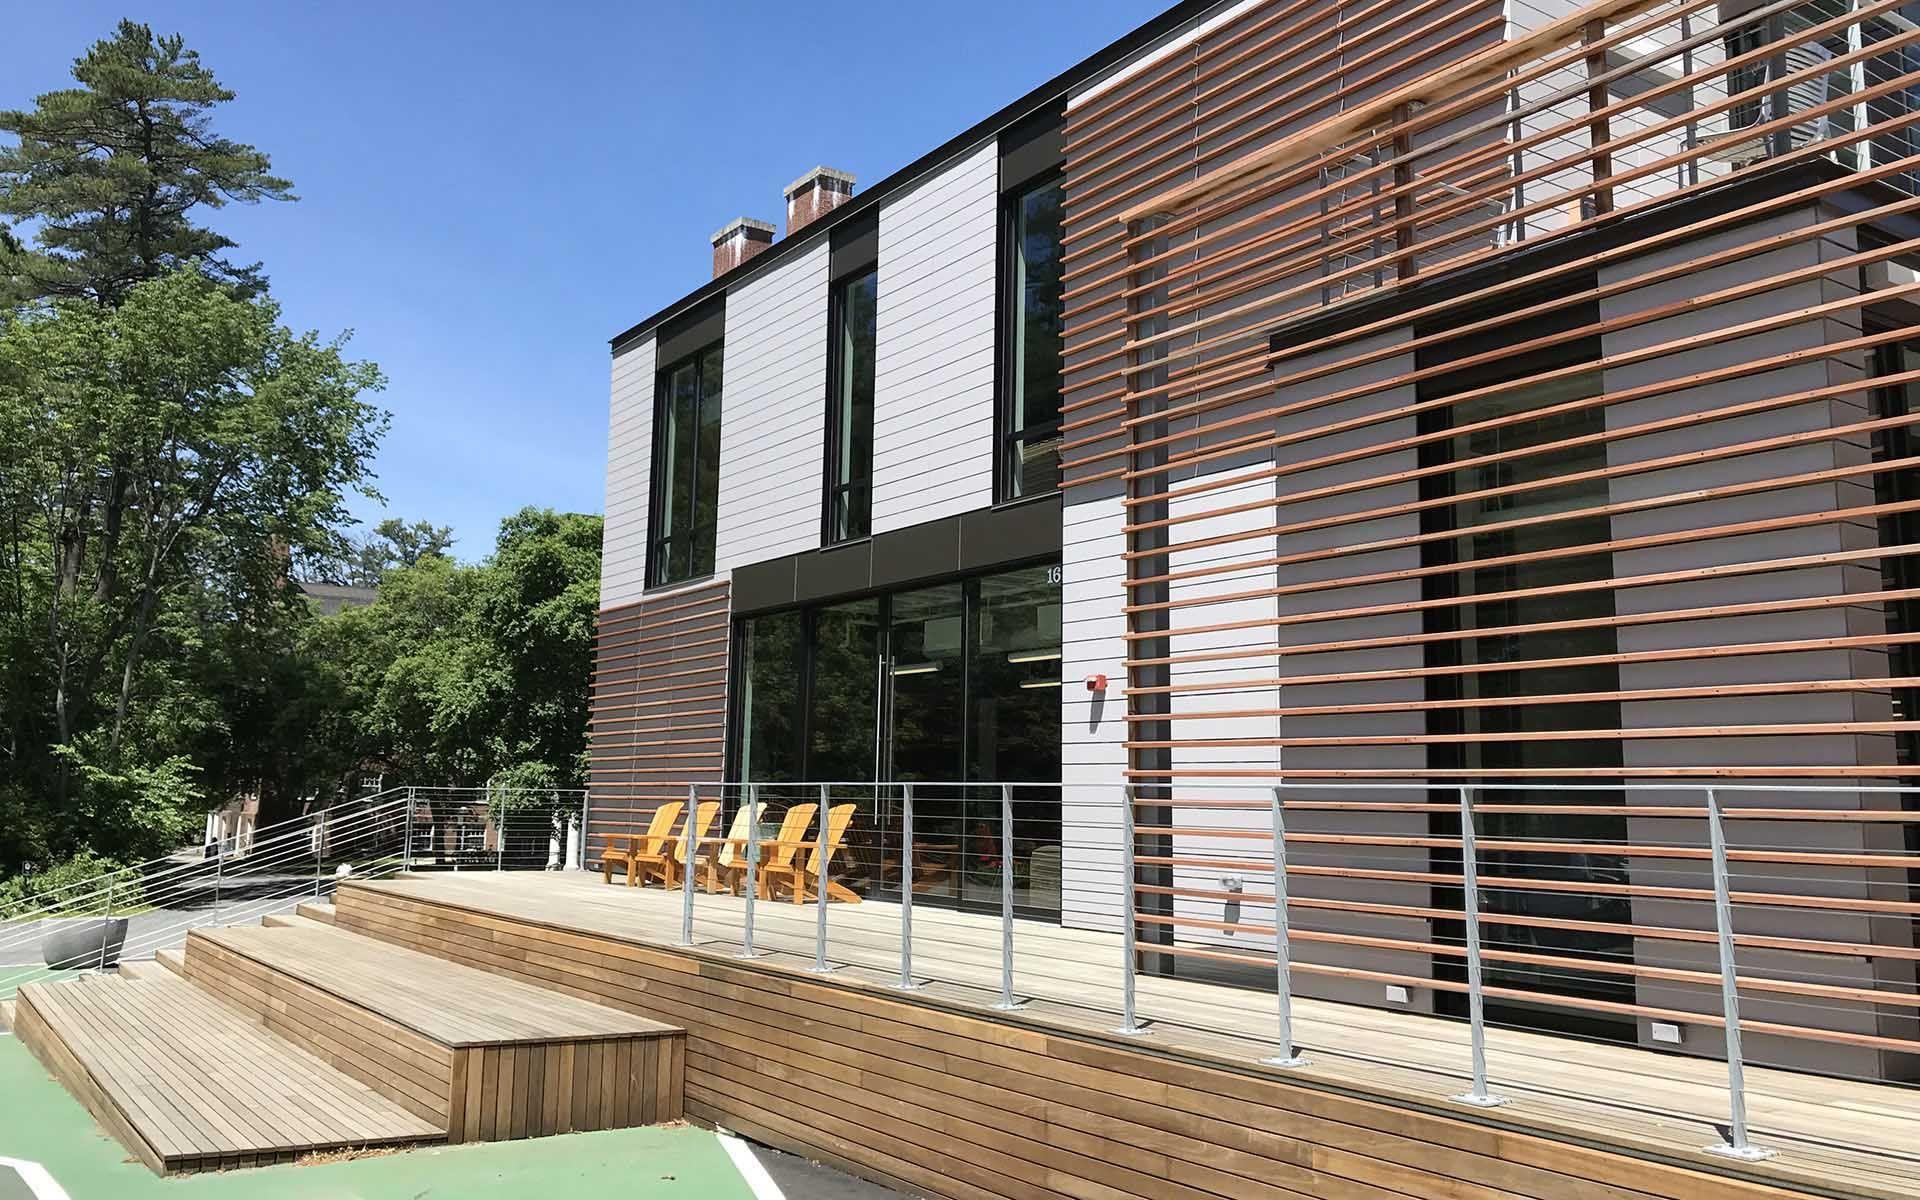 20 Tigerwood Hardwood Decks ideas   hardwood decking, deck ...